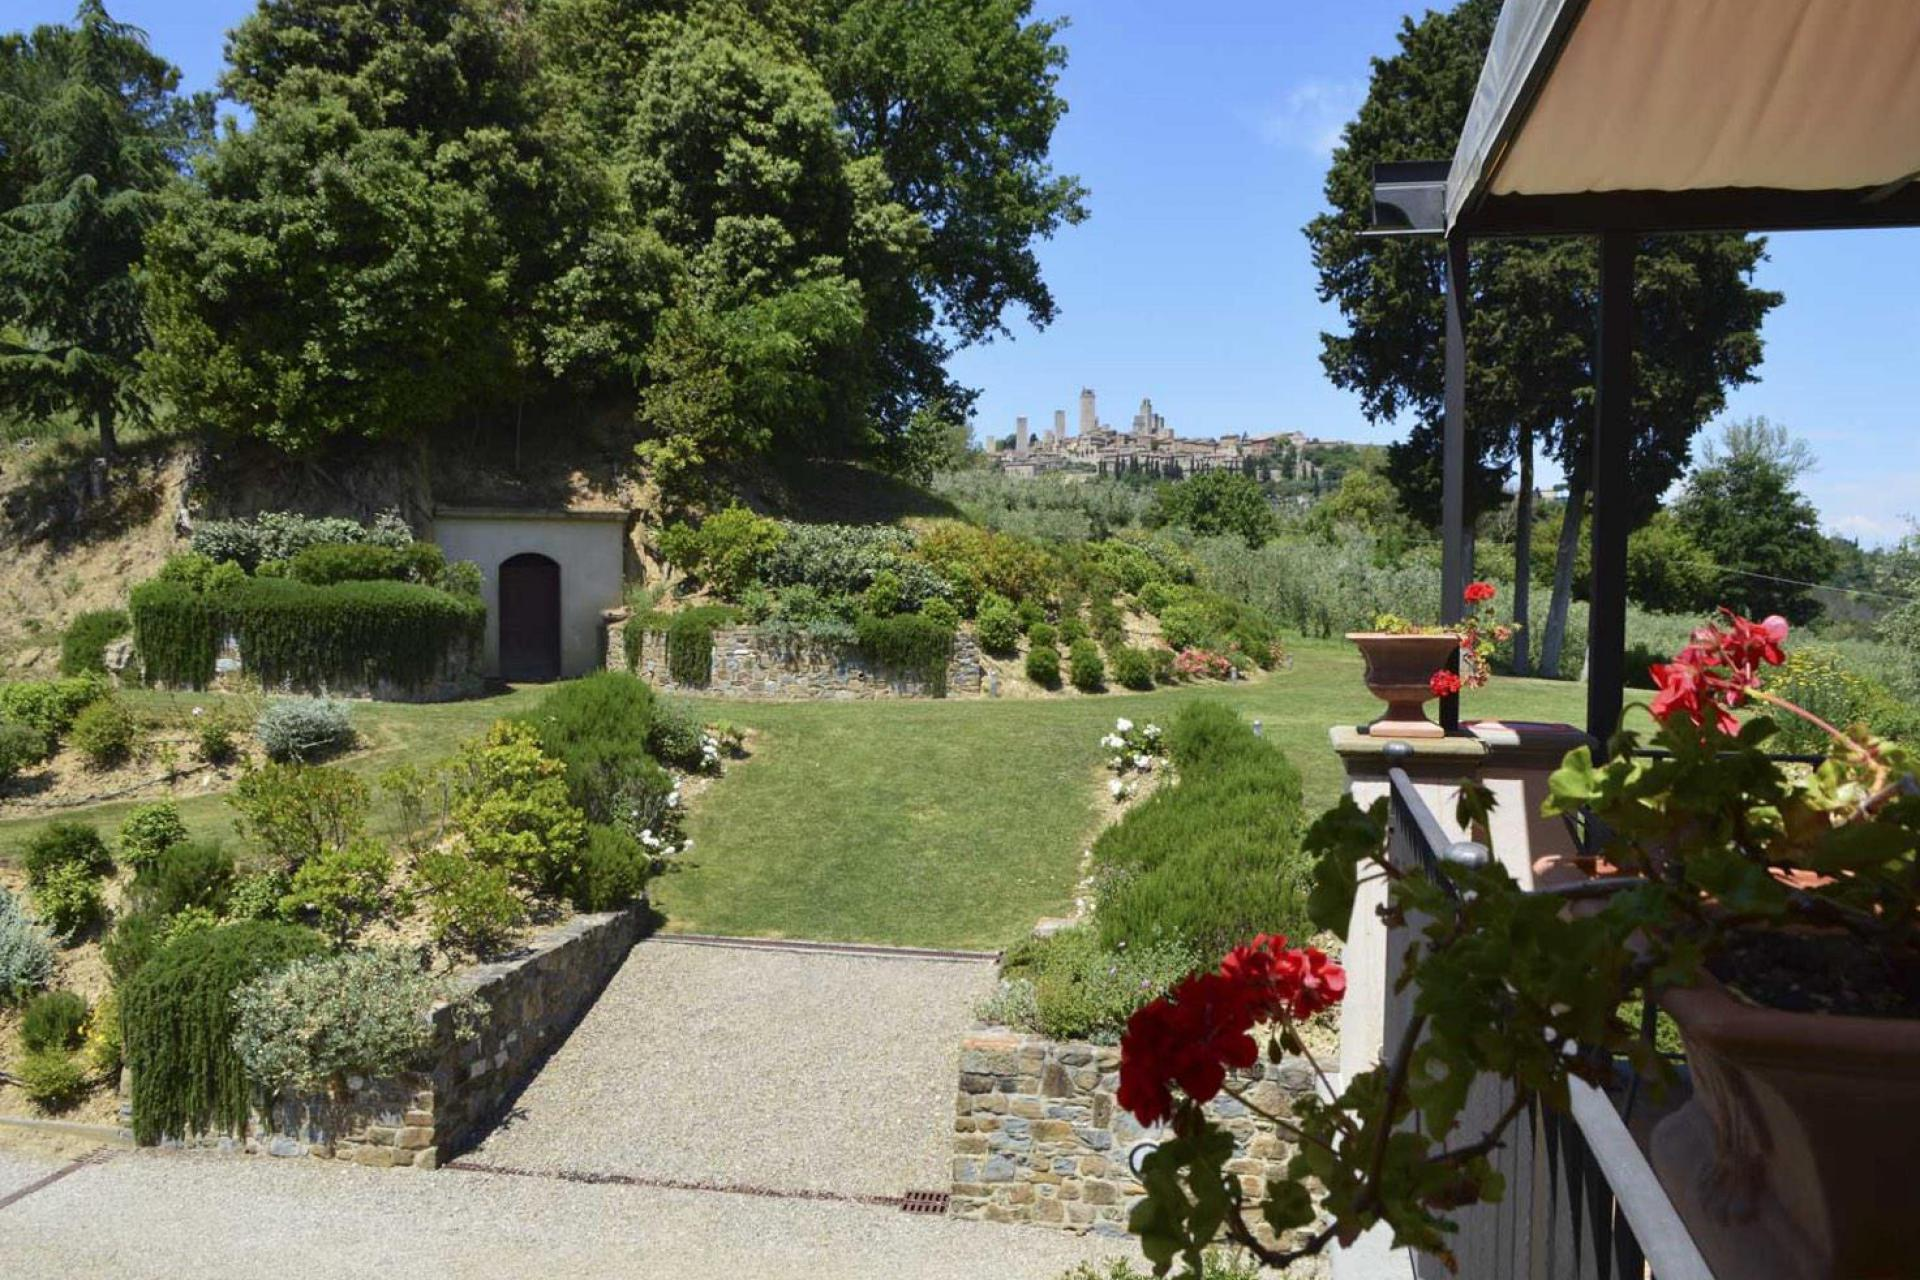 Agriturismo Toskana Agriturismo Toskana, mit Blick auf San Gimignano